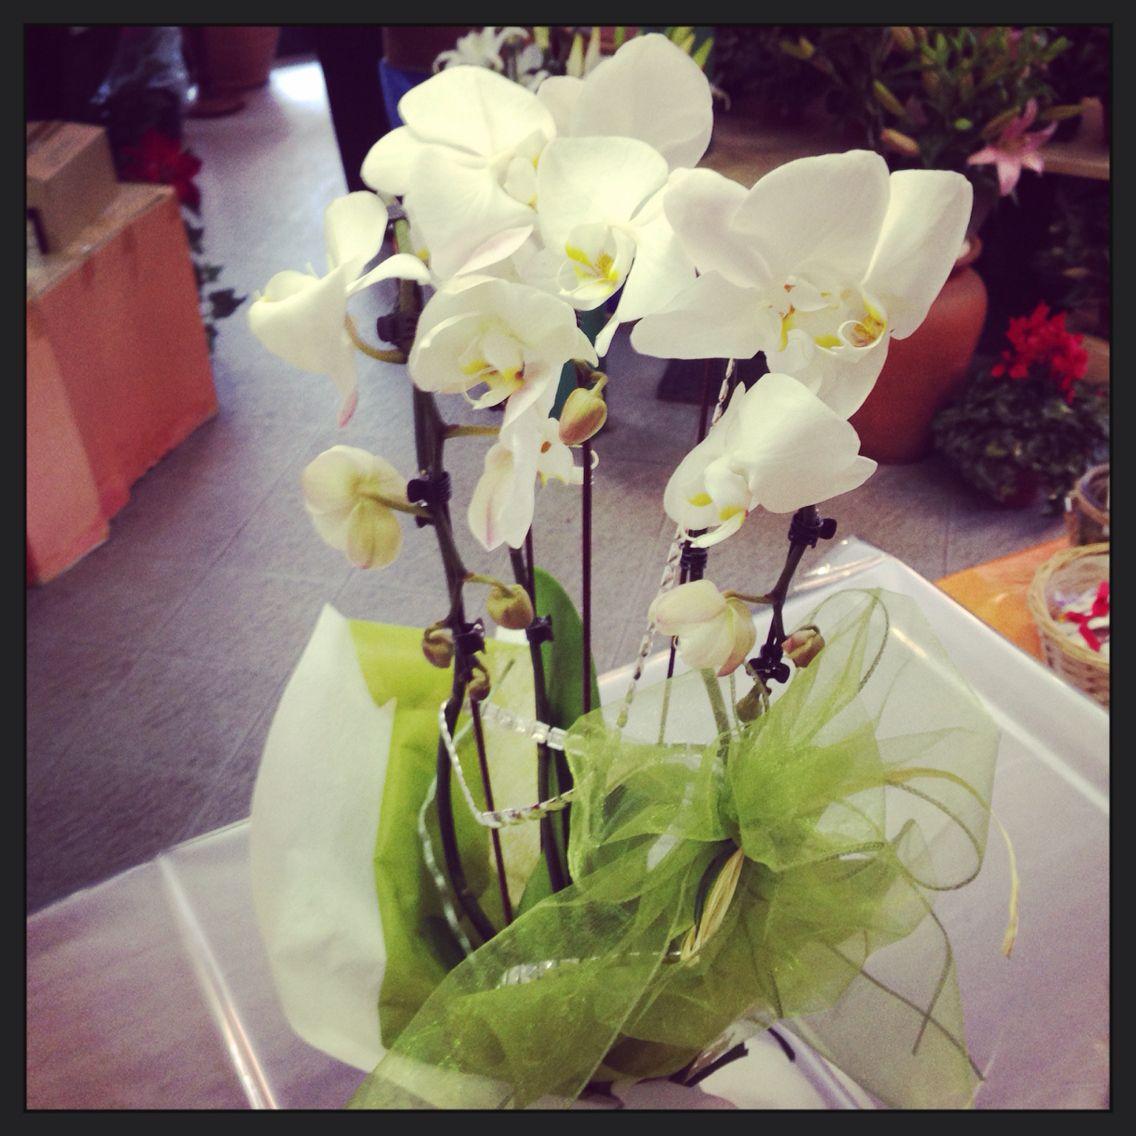 Pianta di orchidea pronta per un compleanno a padova for Orchidea pianta